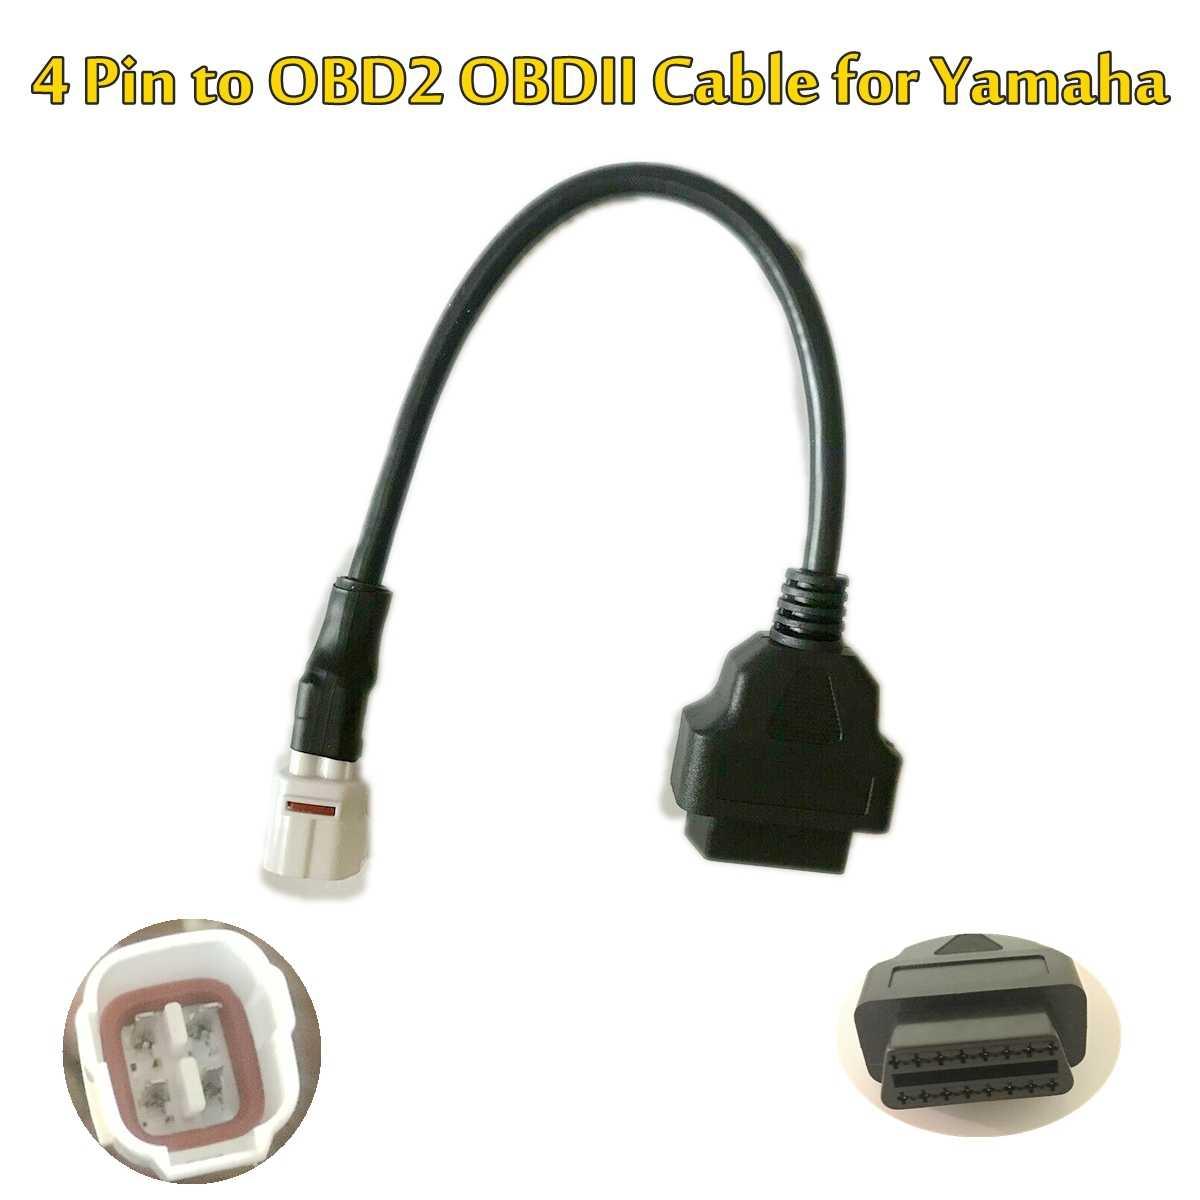 Yamaha OBD2 3 Pin diagnostic Plug Adapter Cable For Motorcycle Bike ATV